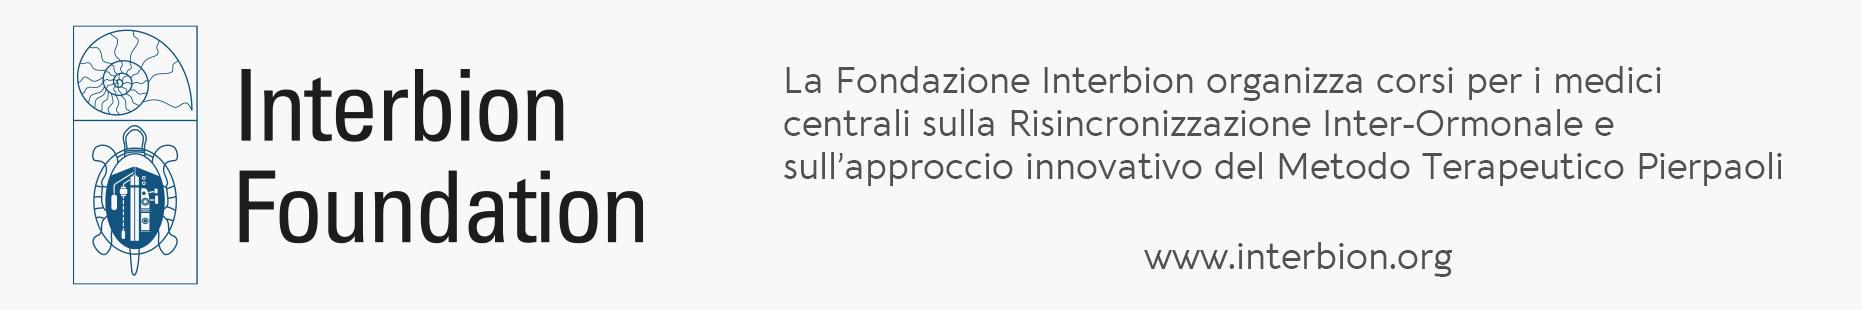 Interbion foundation